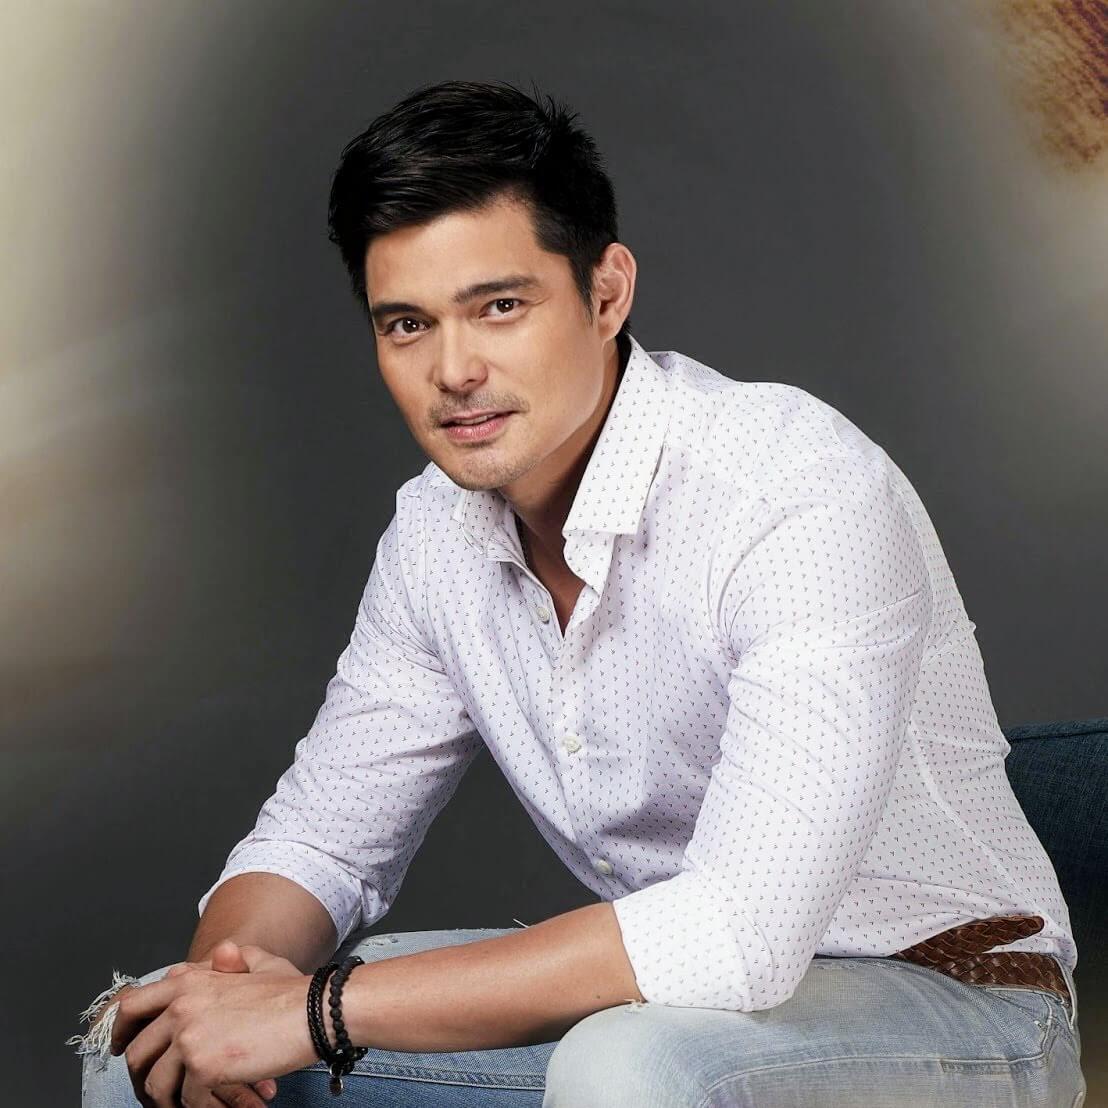 Dingdong Dantes Biography • Filipino film and television Actor